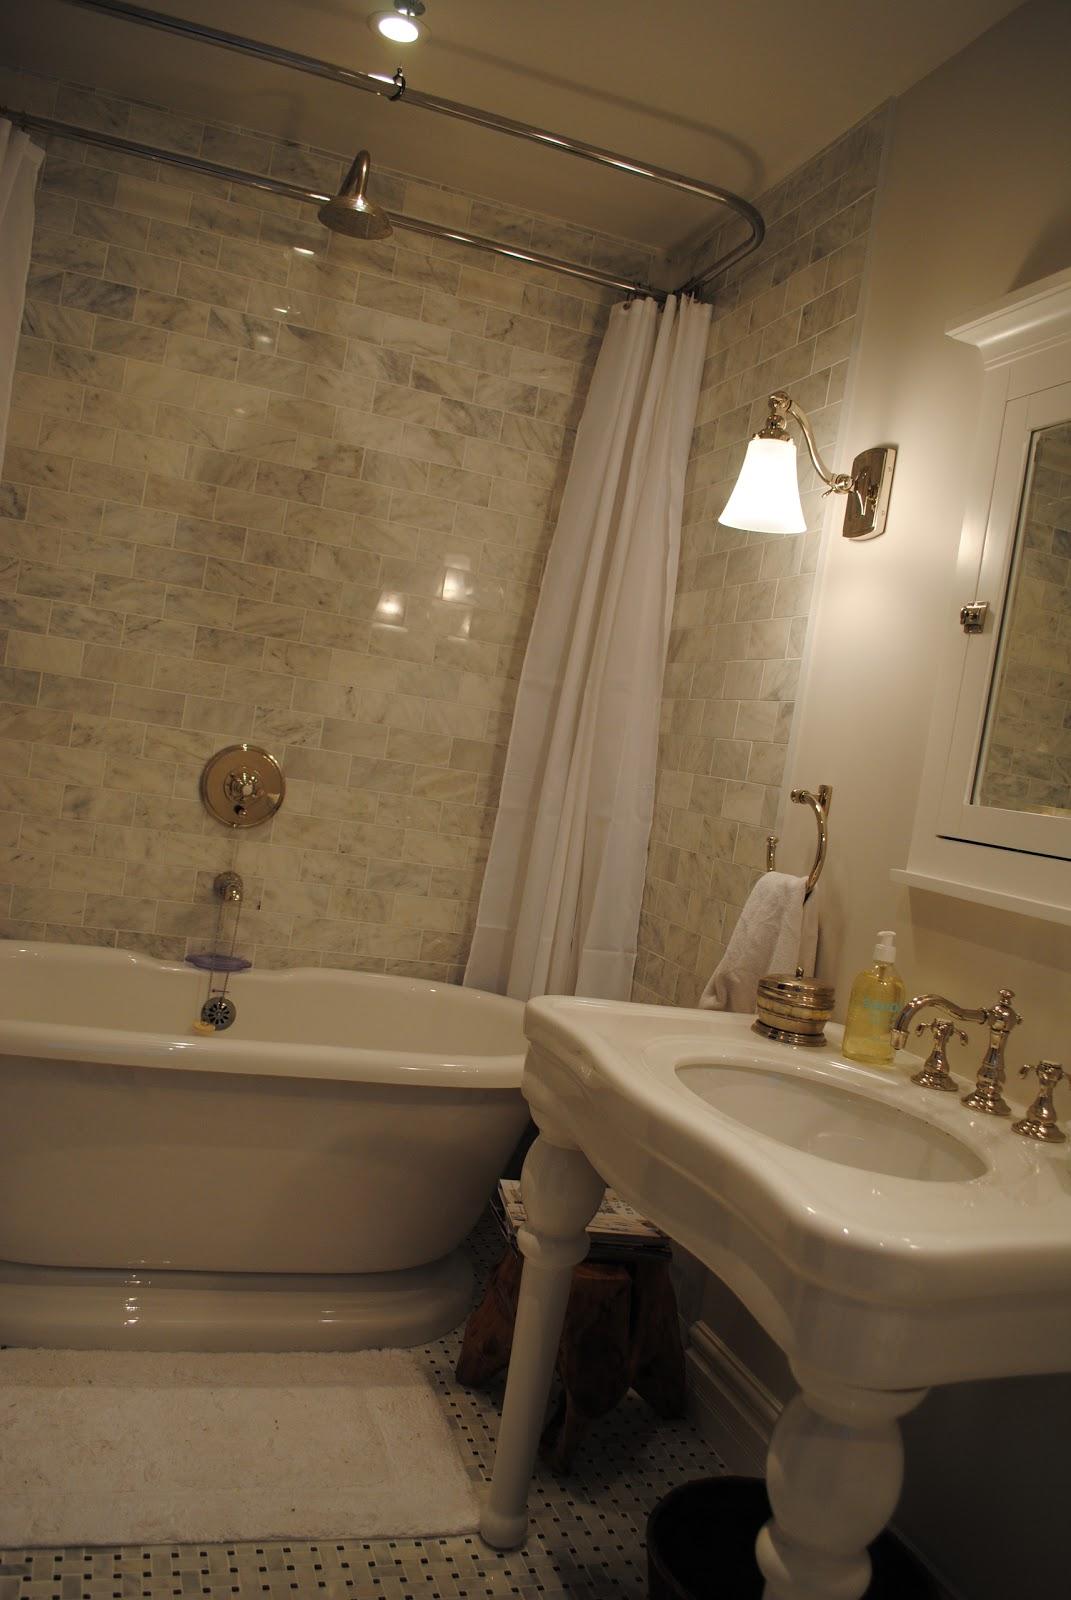 Razmataz bathroom reno before and after for How to reno a bathroom